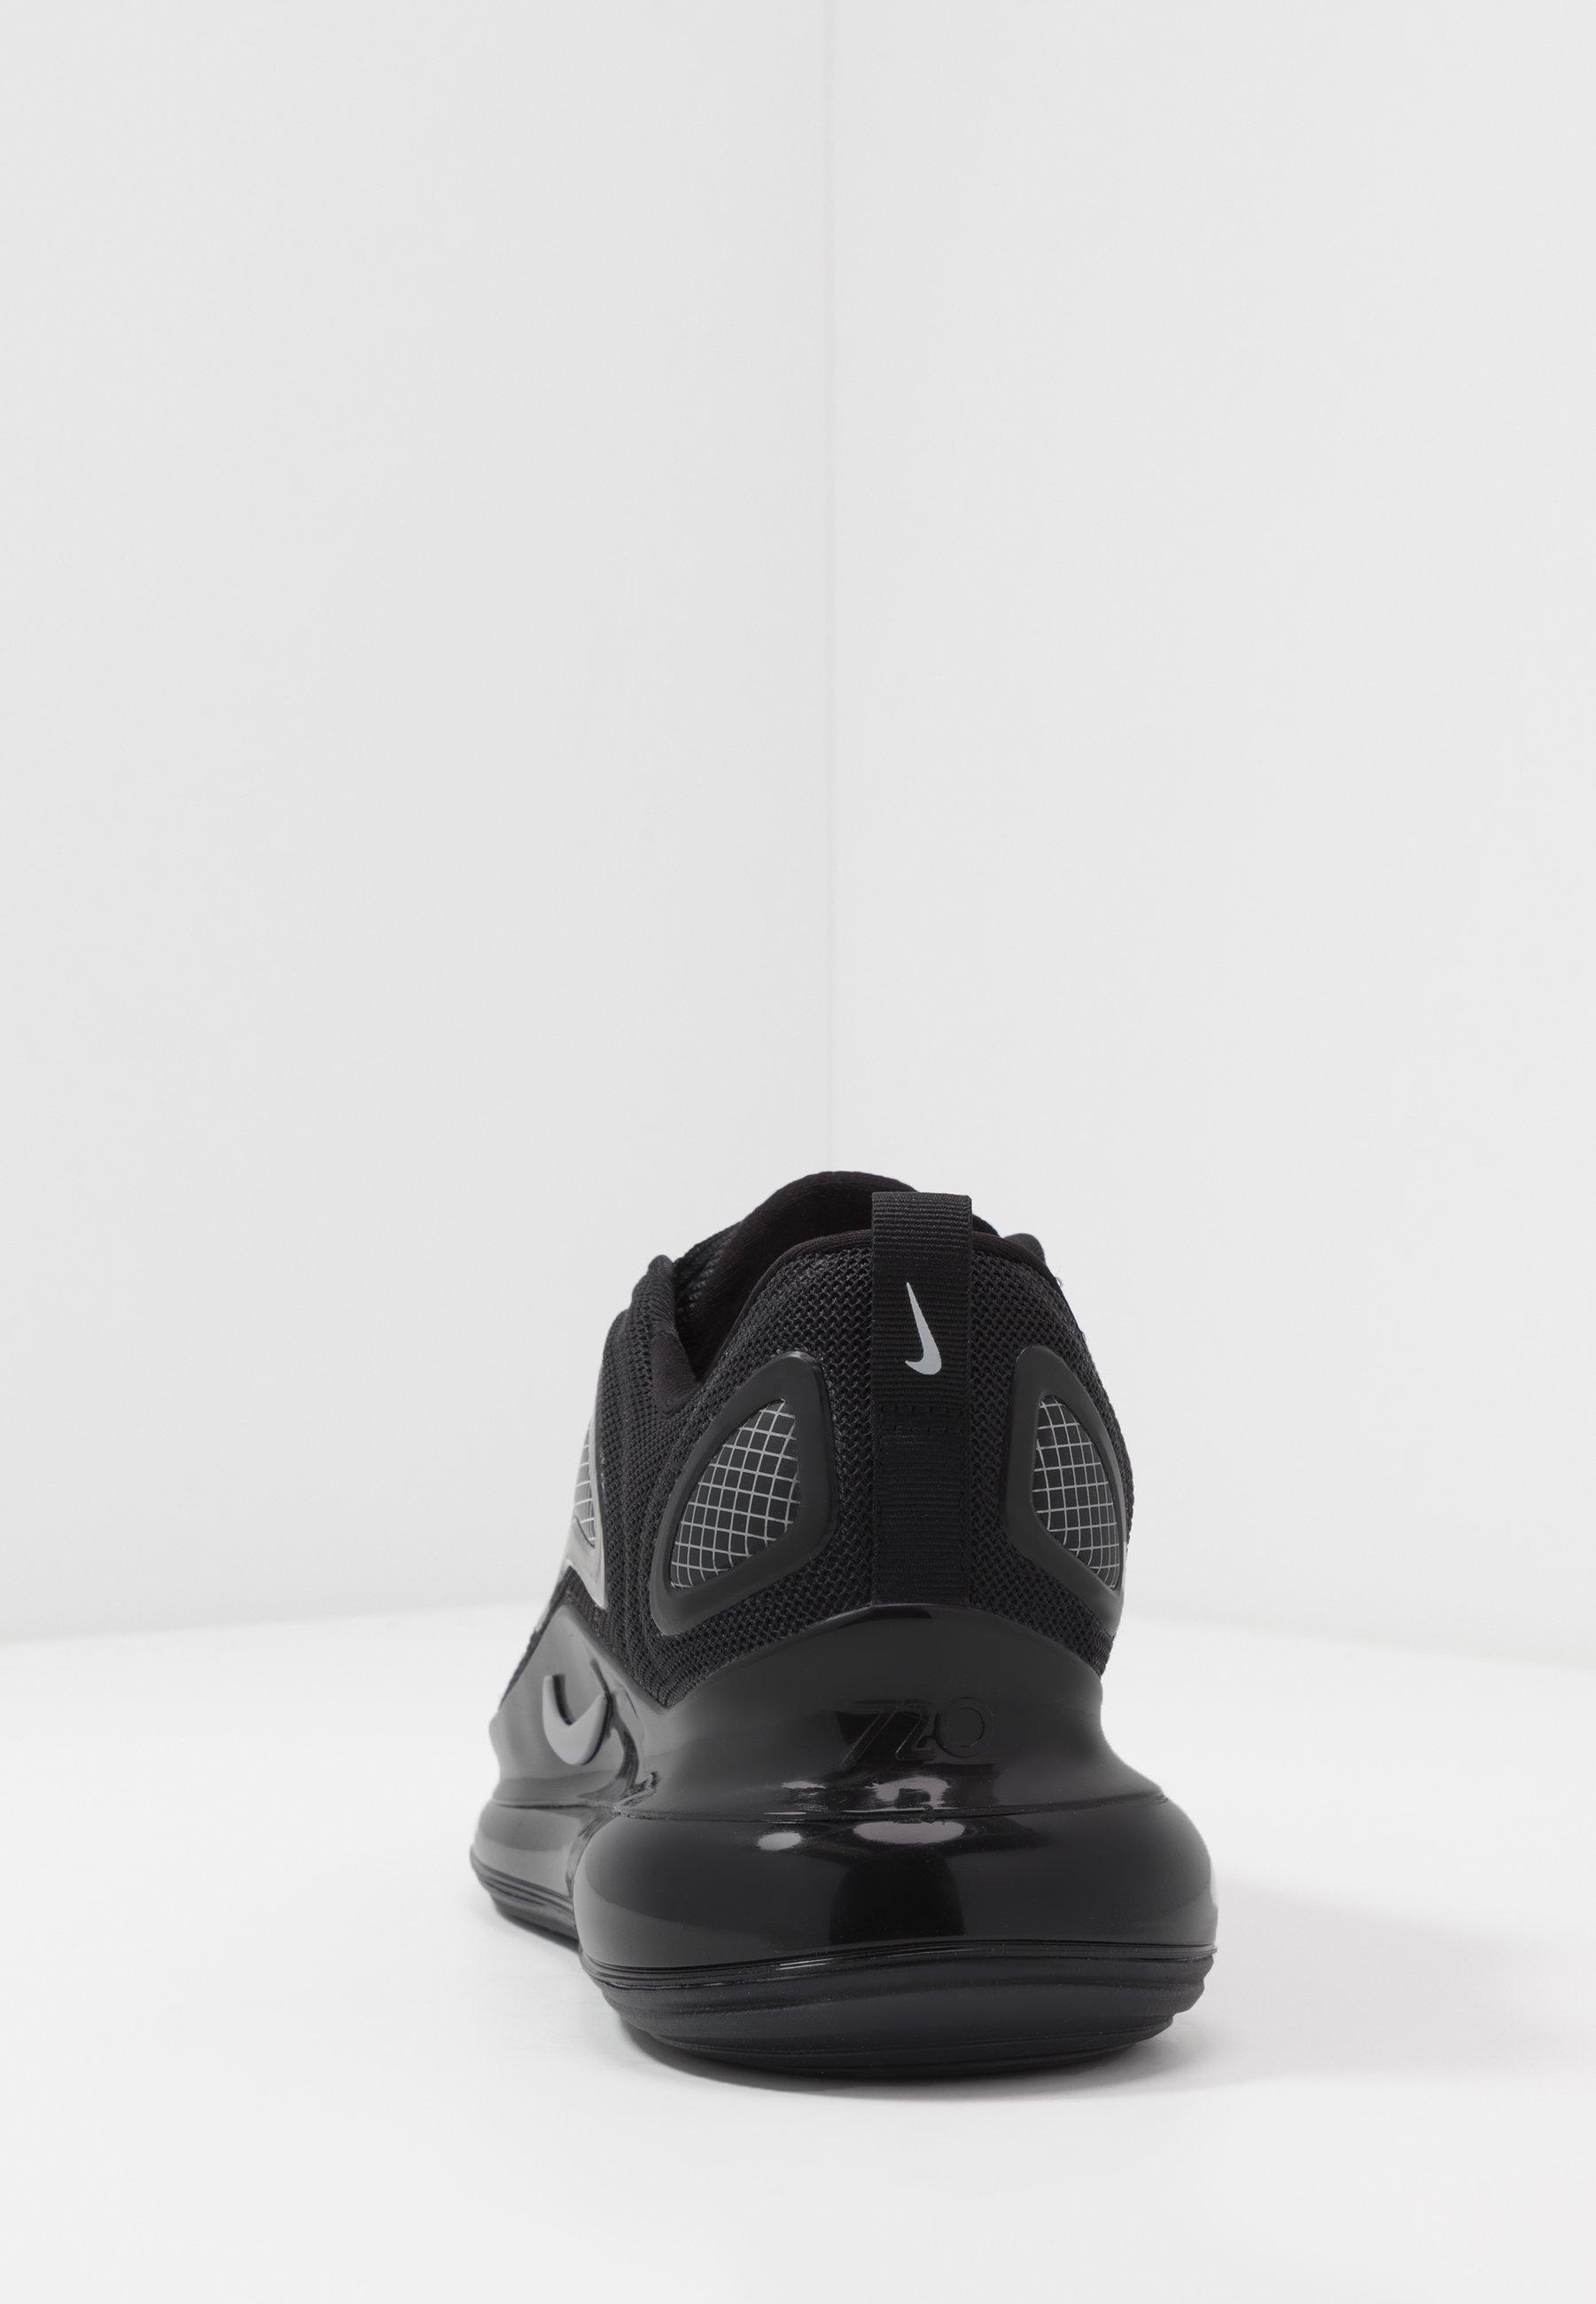 Nike Sportswear Air Max 720 Rvl - Sneakers Black/white